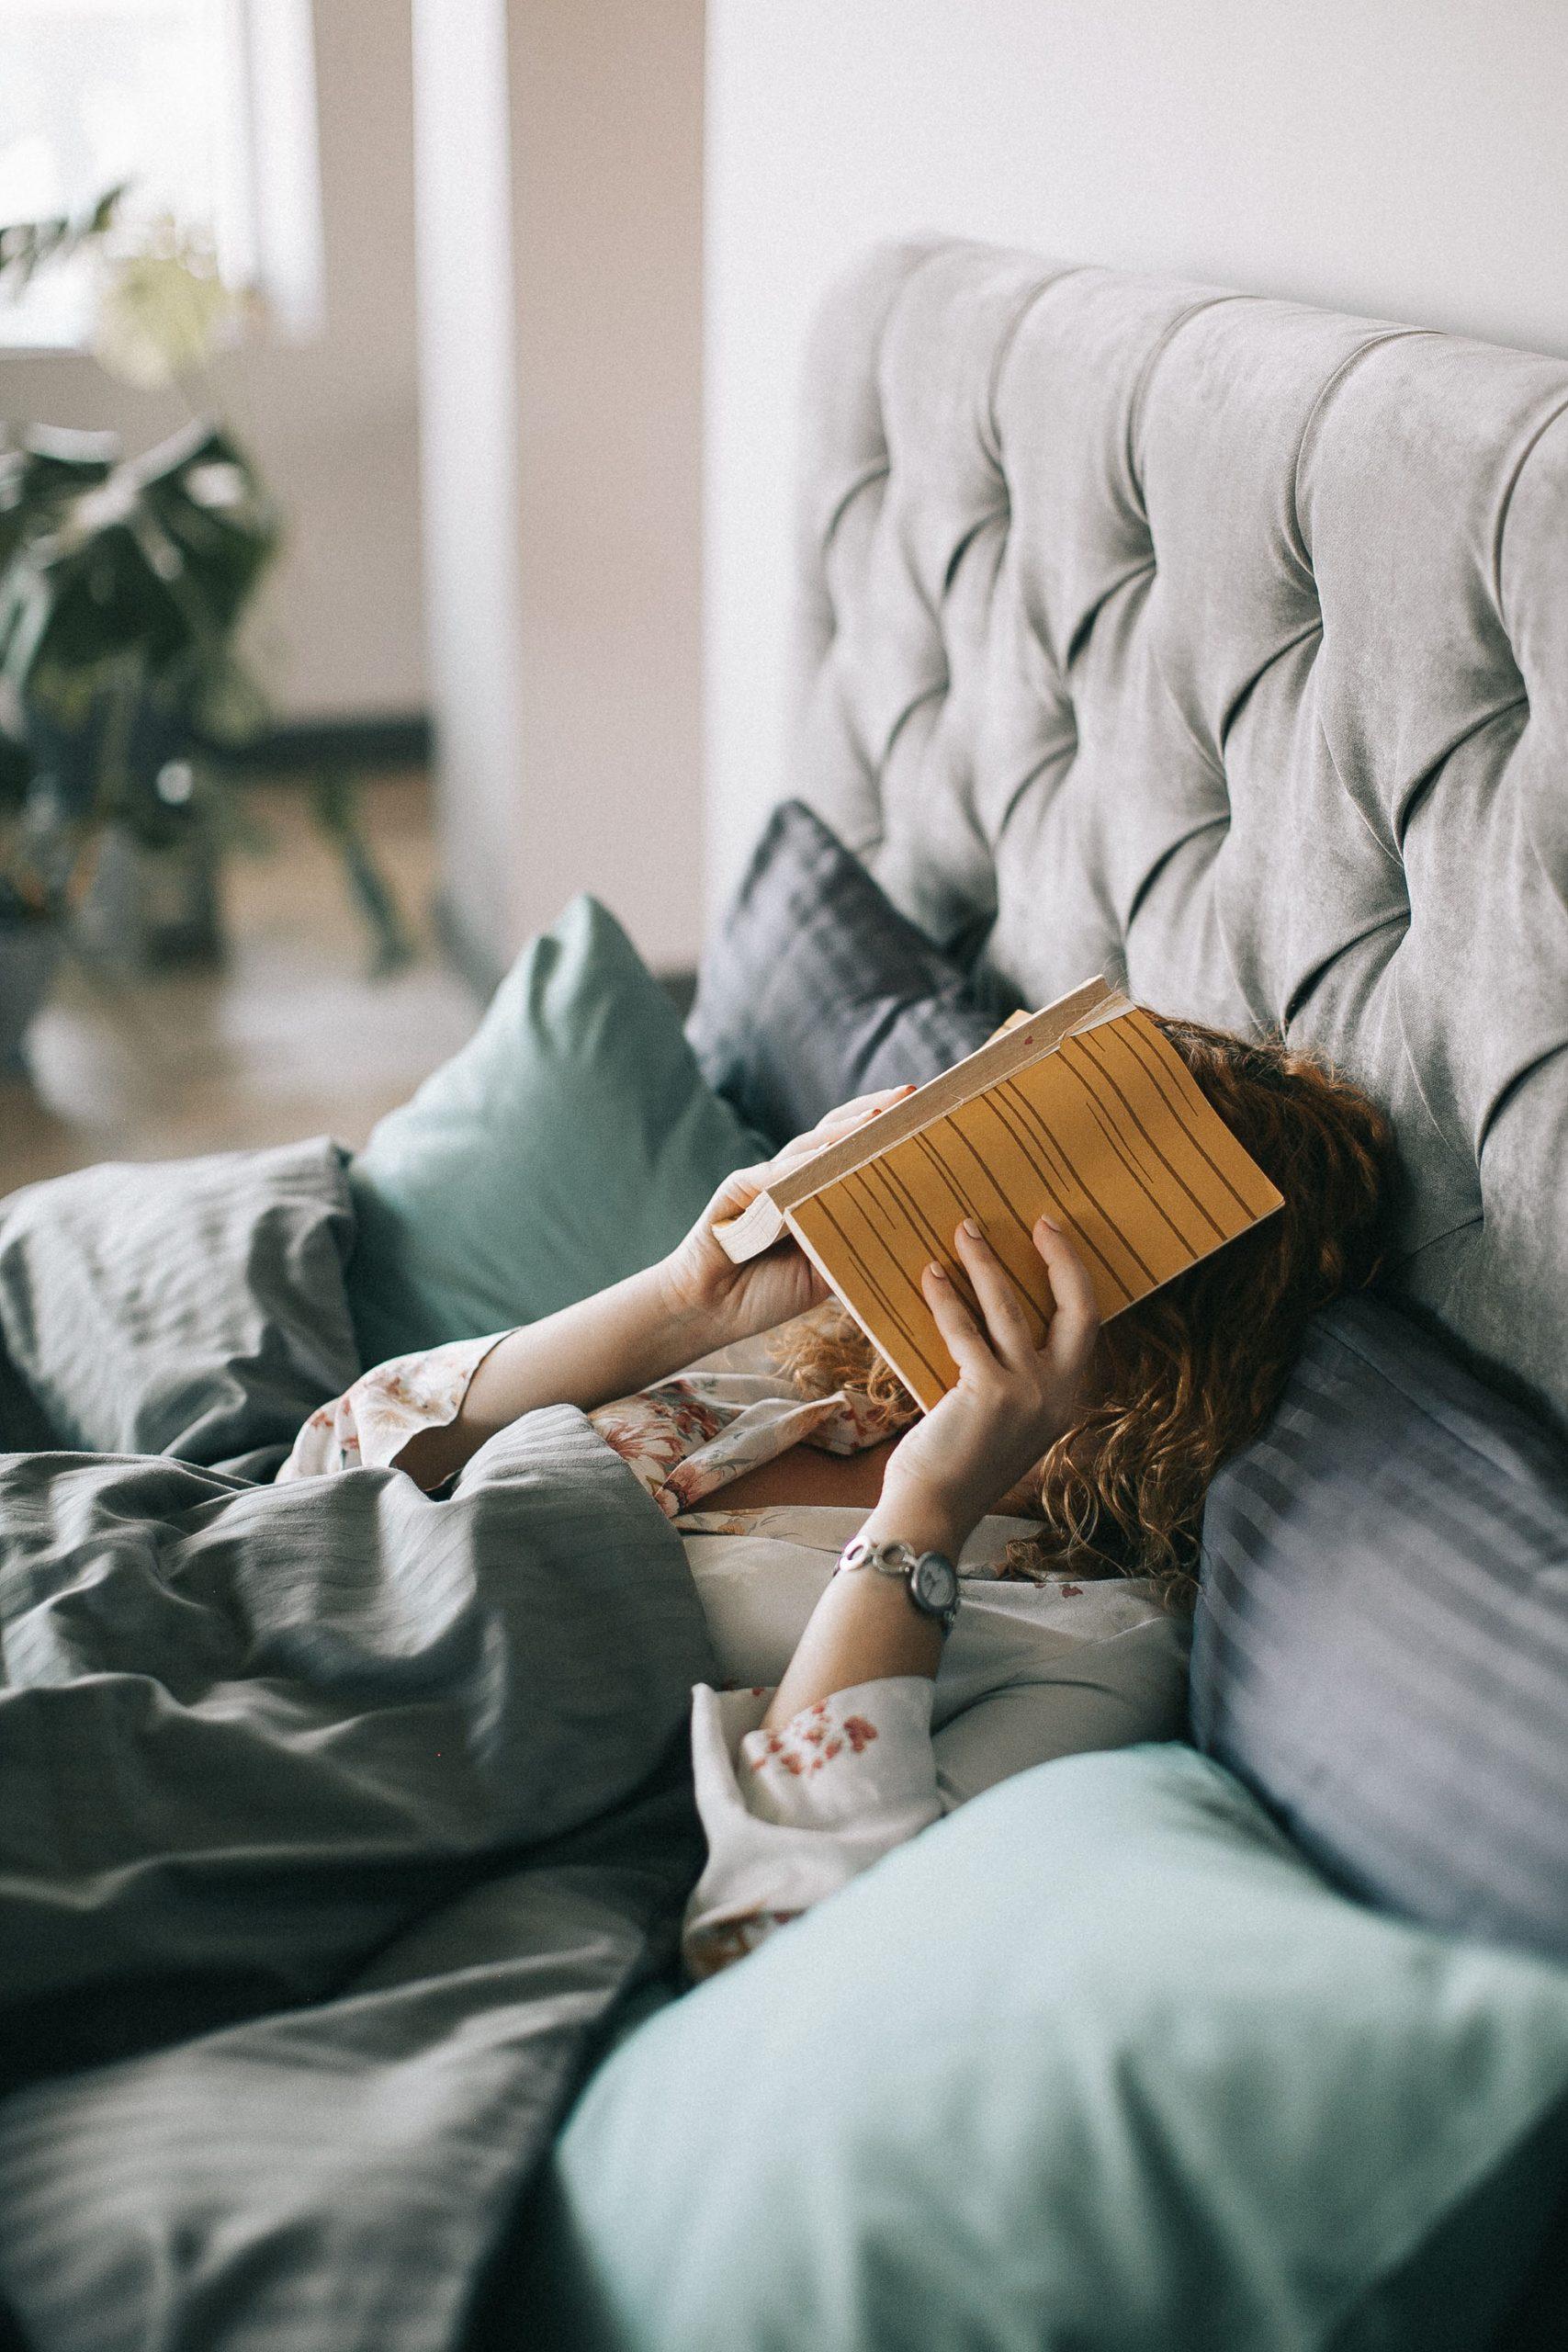 Dorme mal? A culpa pode ser da tiróide